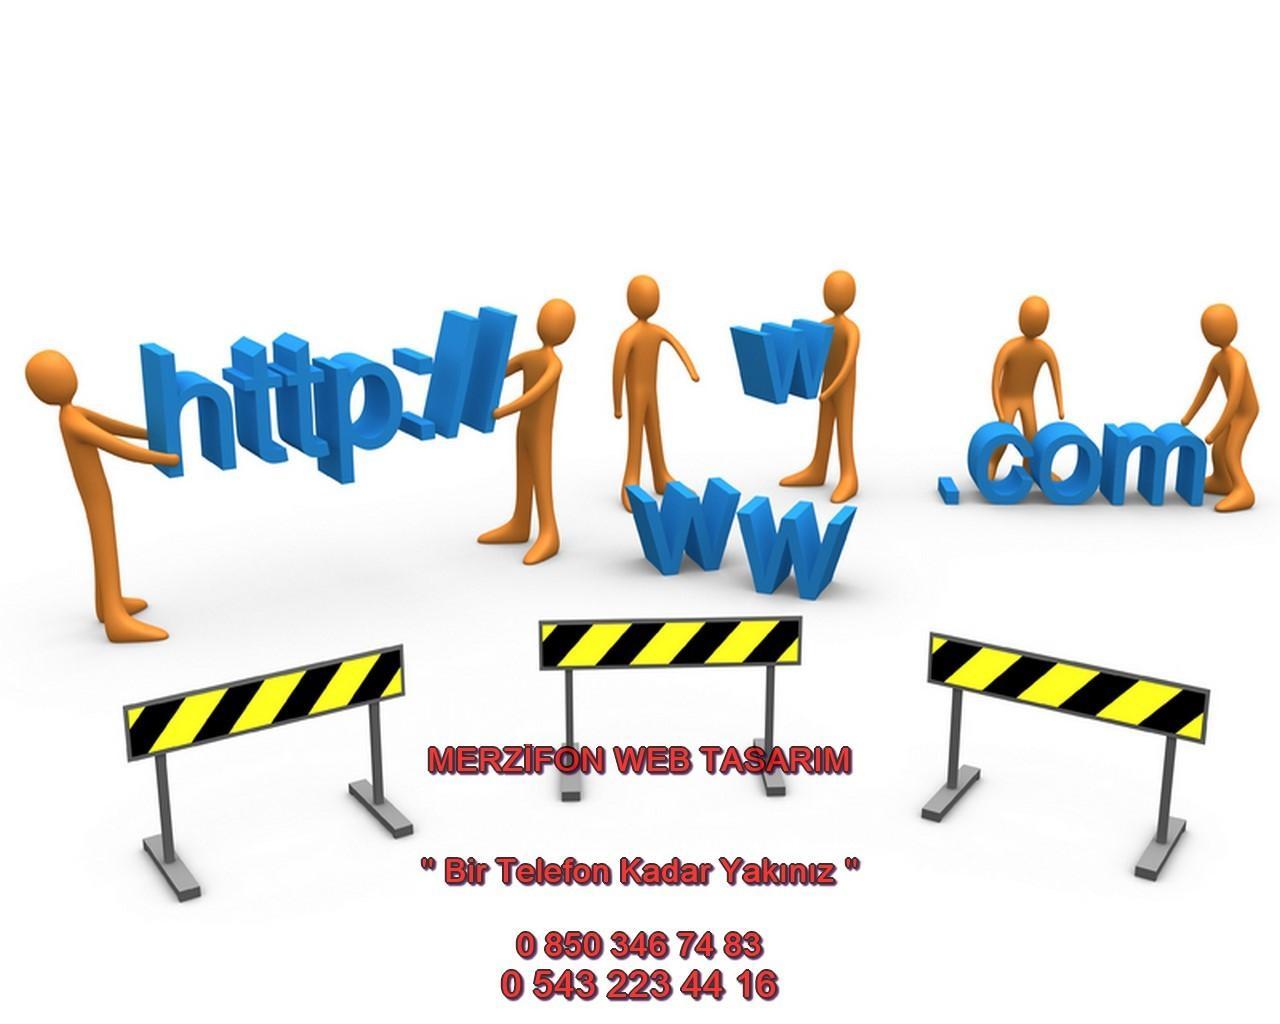 Merzifon Web Tasarım